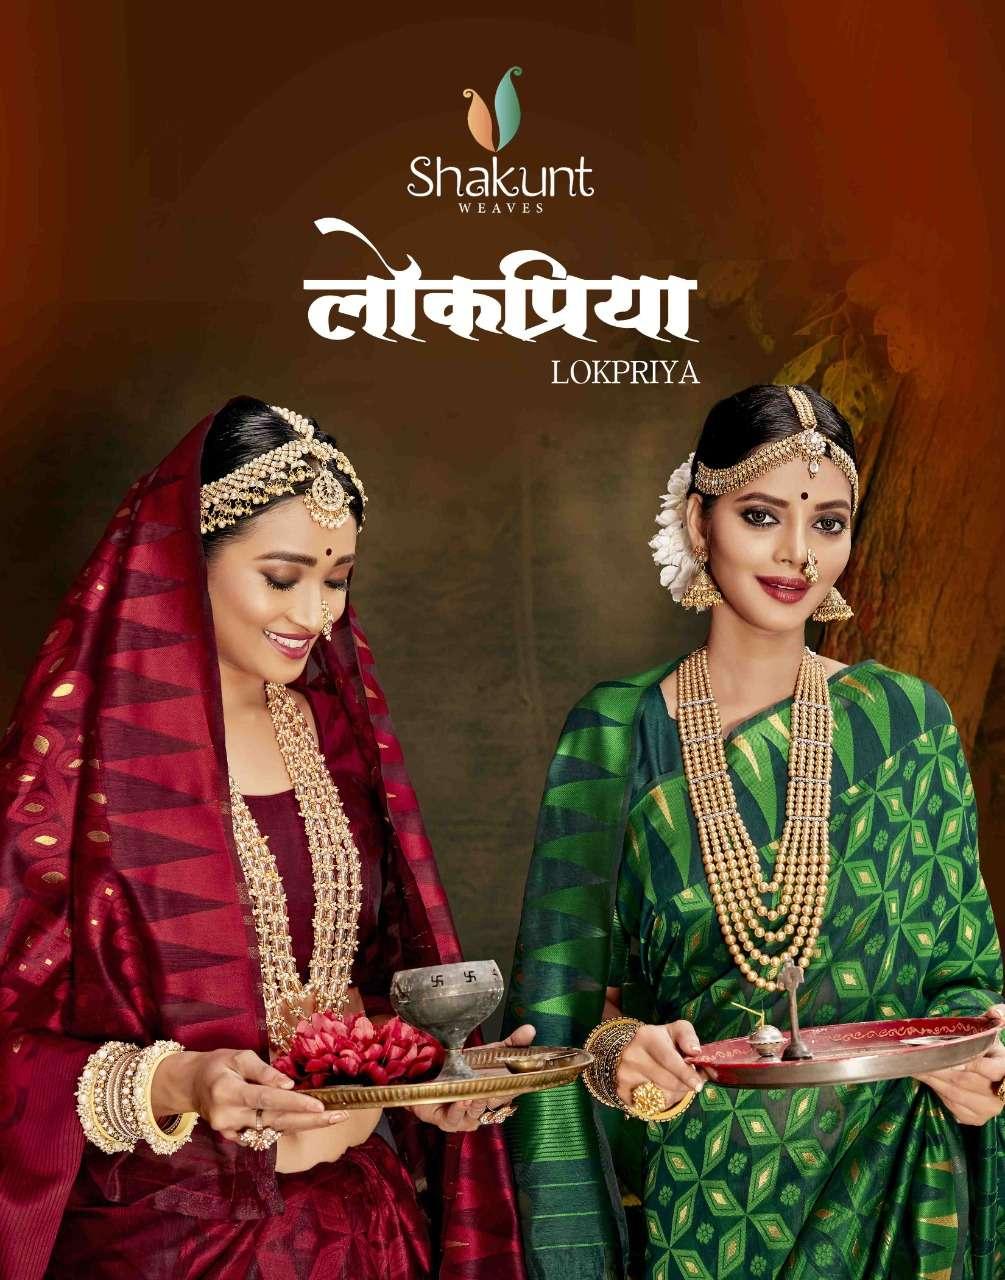 Shakunt Lokpriya Series 11221-11228 Cotton Weaving Saree